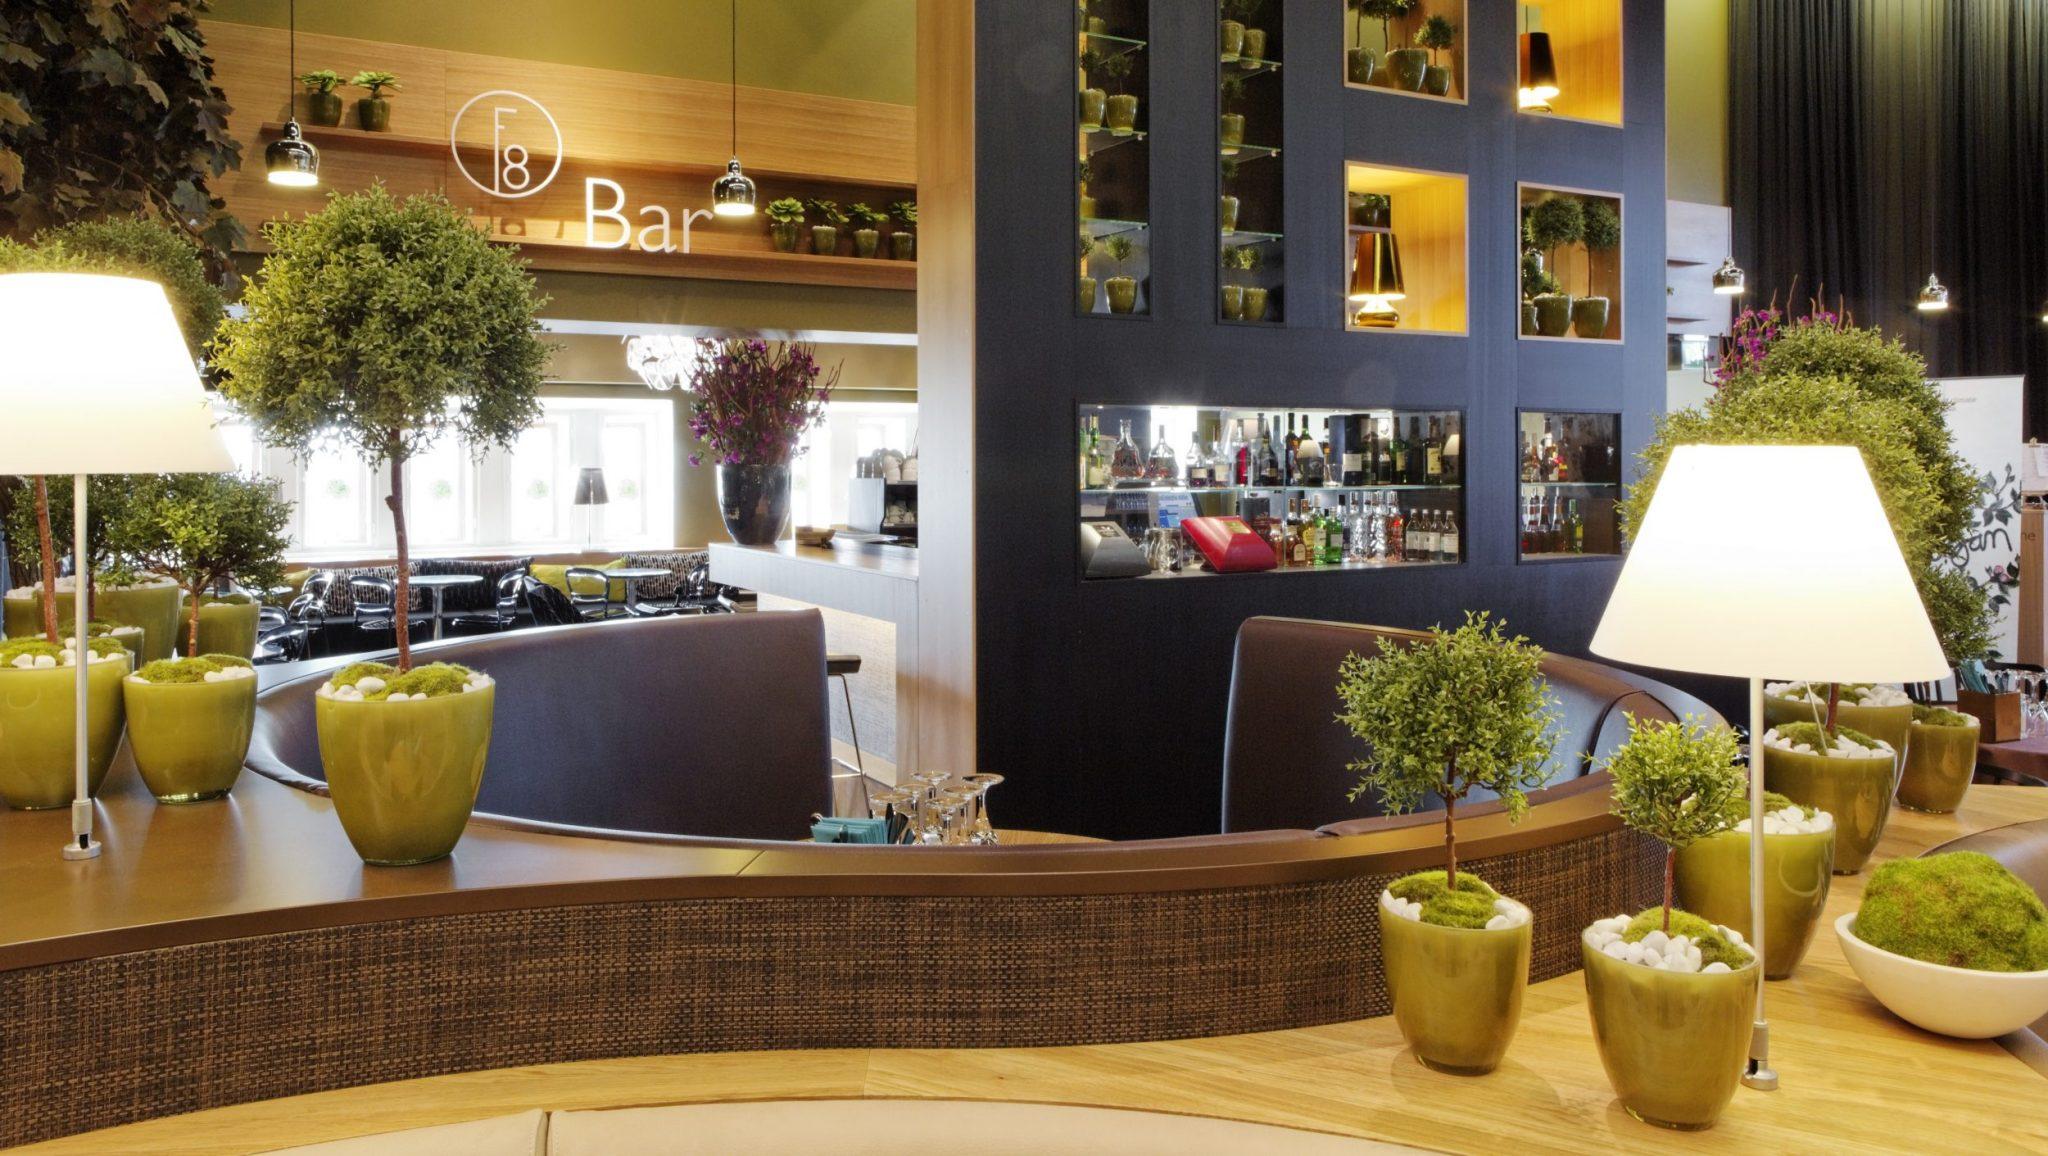 Fazer-Restaurant-F8-Helsinki-GI-Project-6